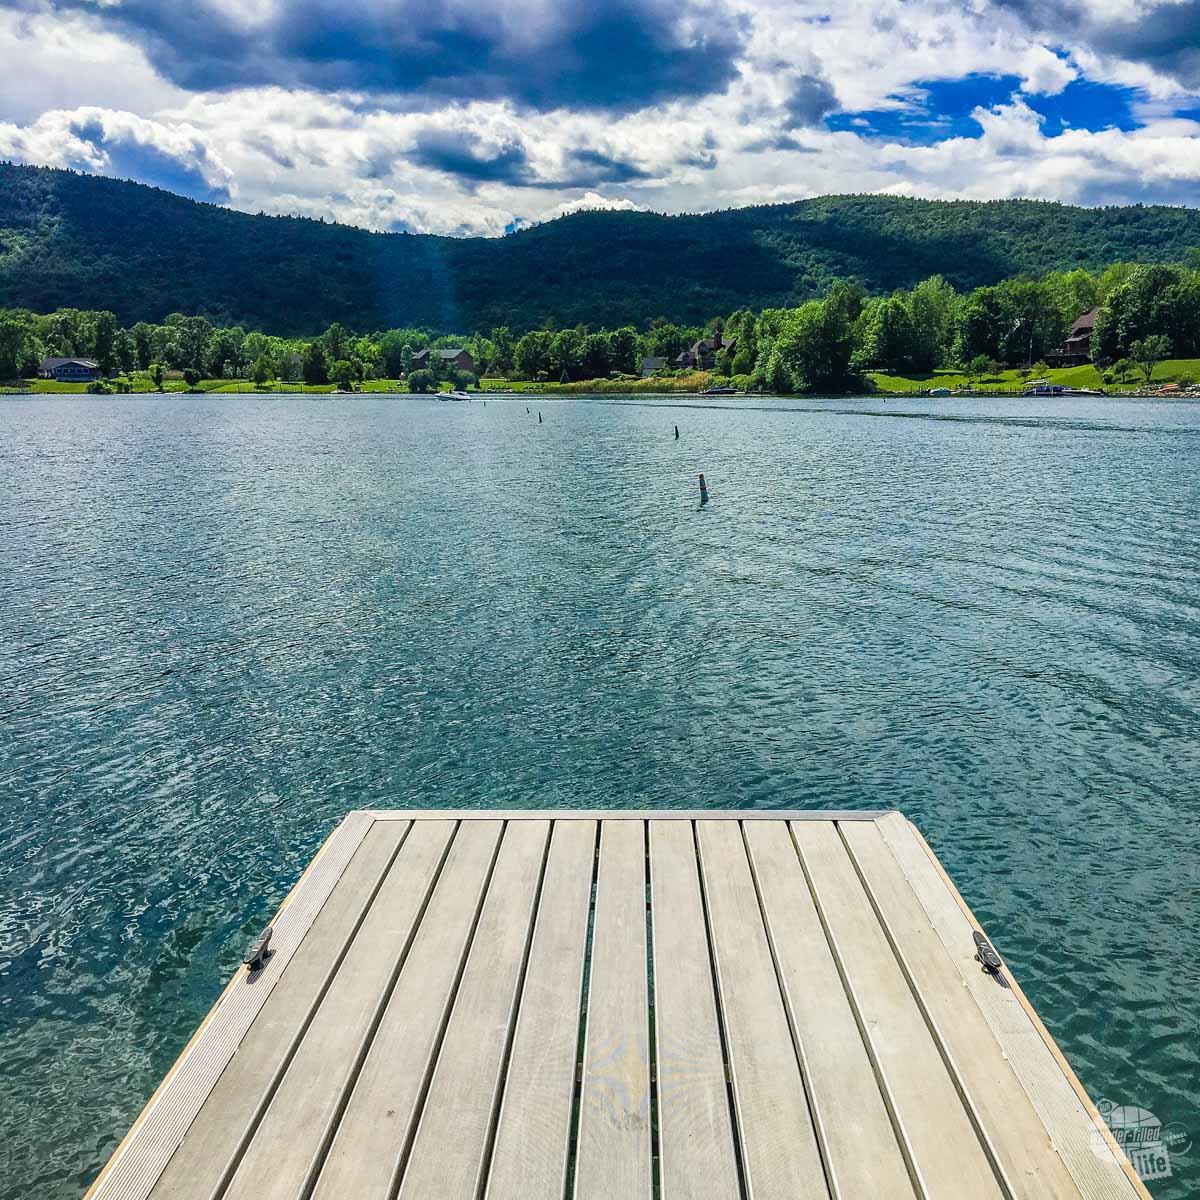 Lake George in the Adirondacks